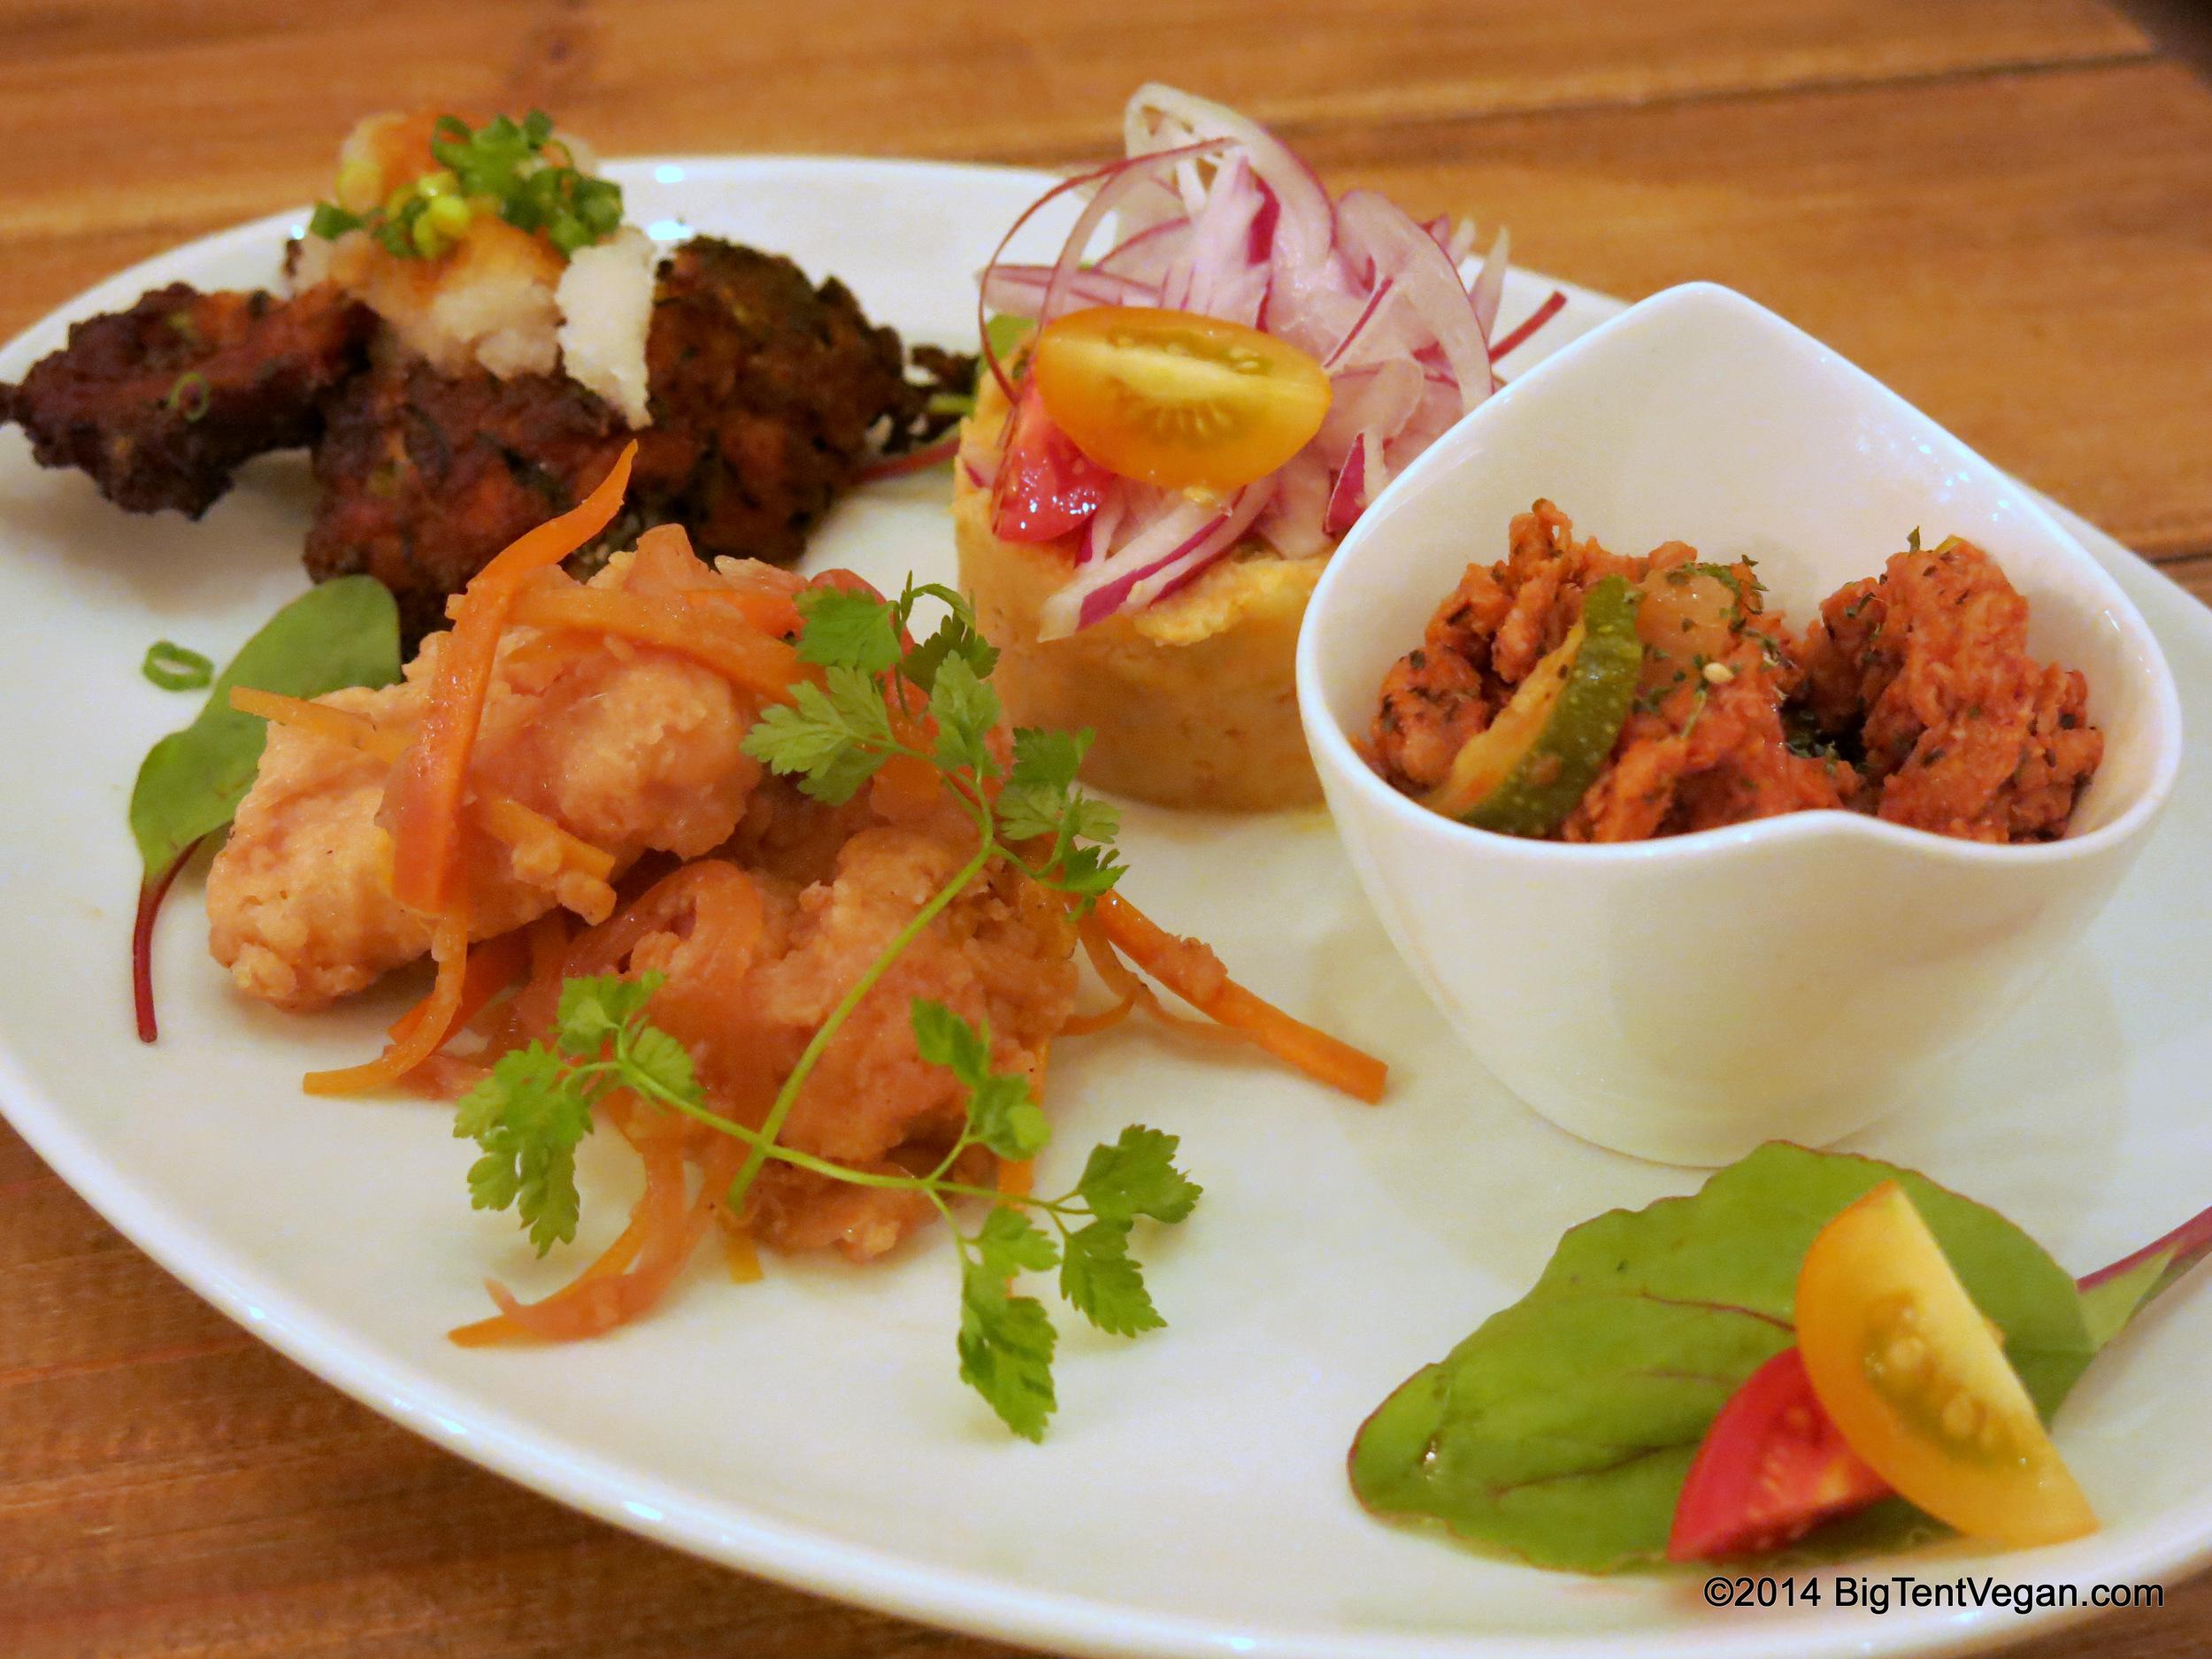 Chef's Appetizer Platter for Set Dinner Course at 100% vegan restaurant Paprika Shokudo (Osaka, Japan)